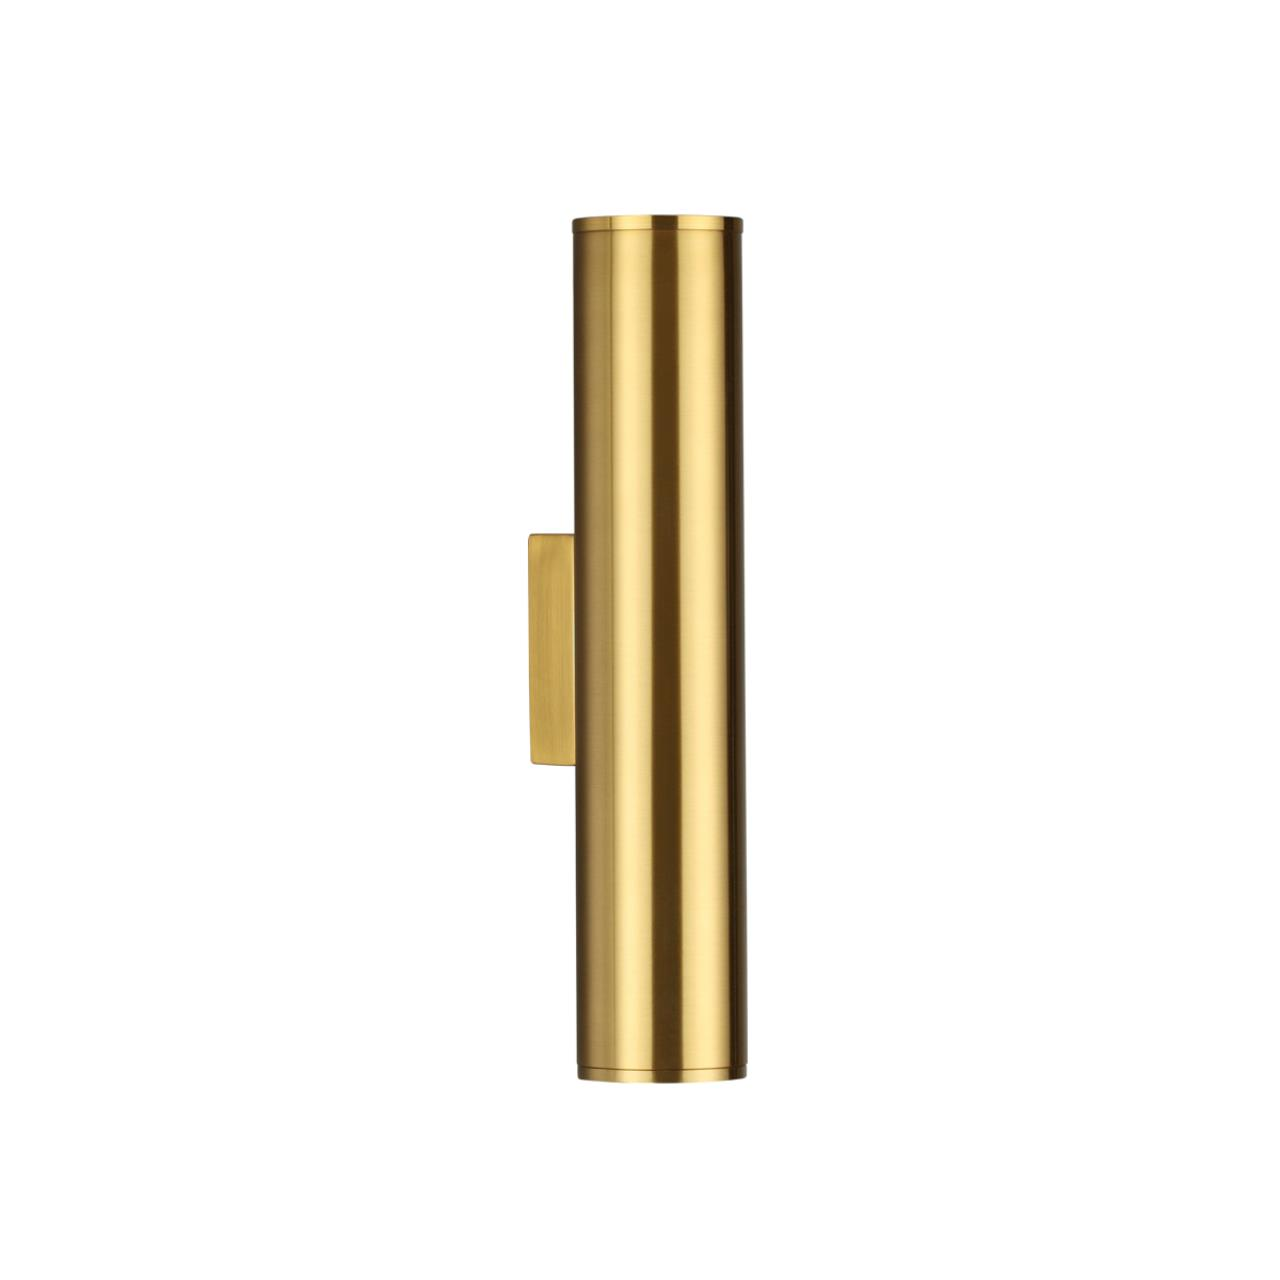 3833/2WA HIGHTECH ODL20 211 золотистый /металл Настенный светильник E27, LED 7W 220V DARIO